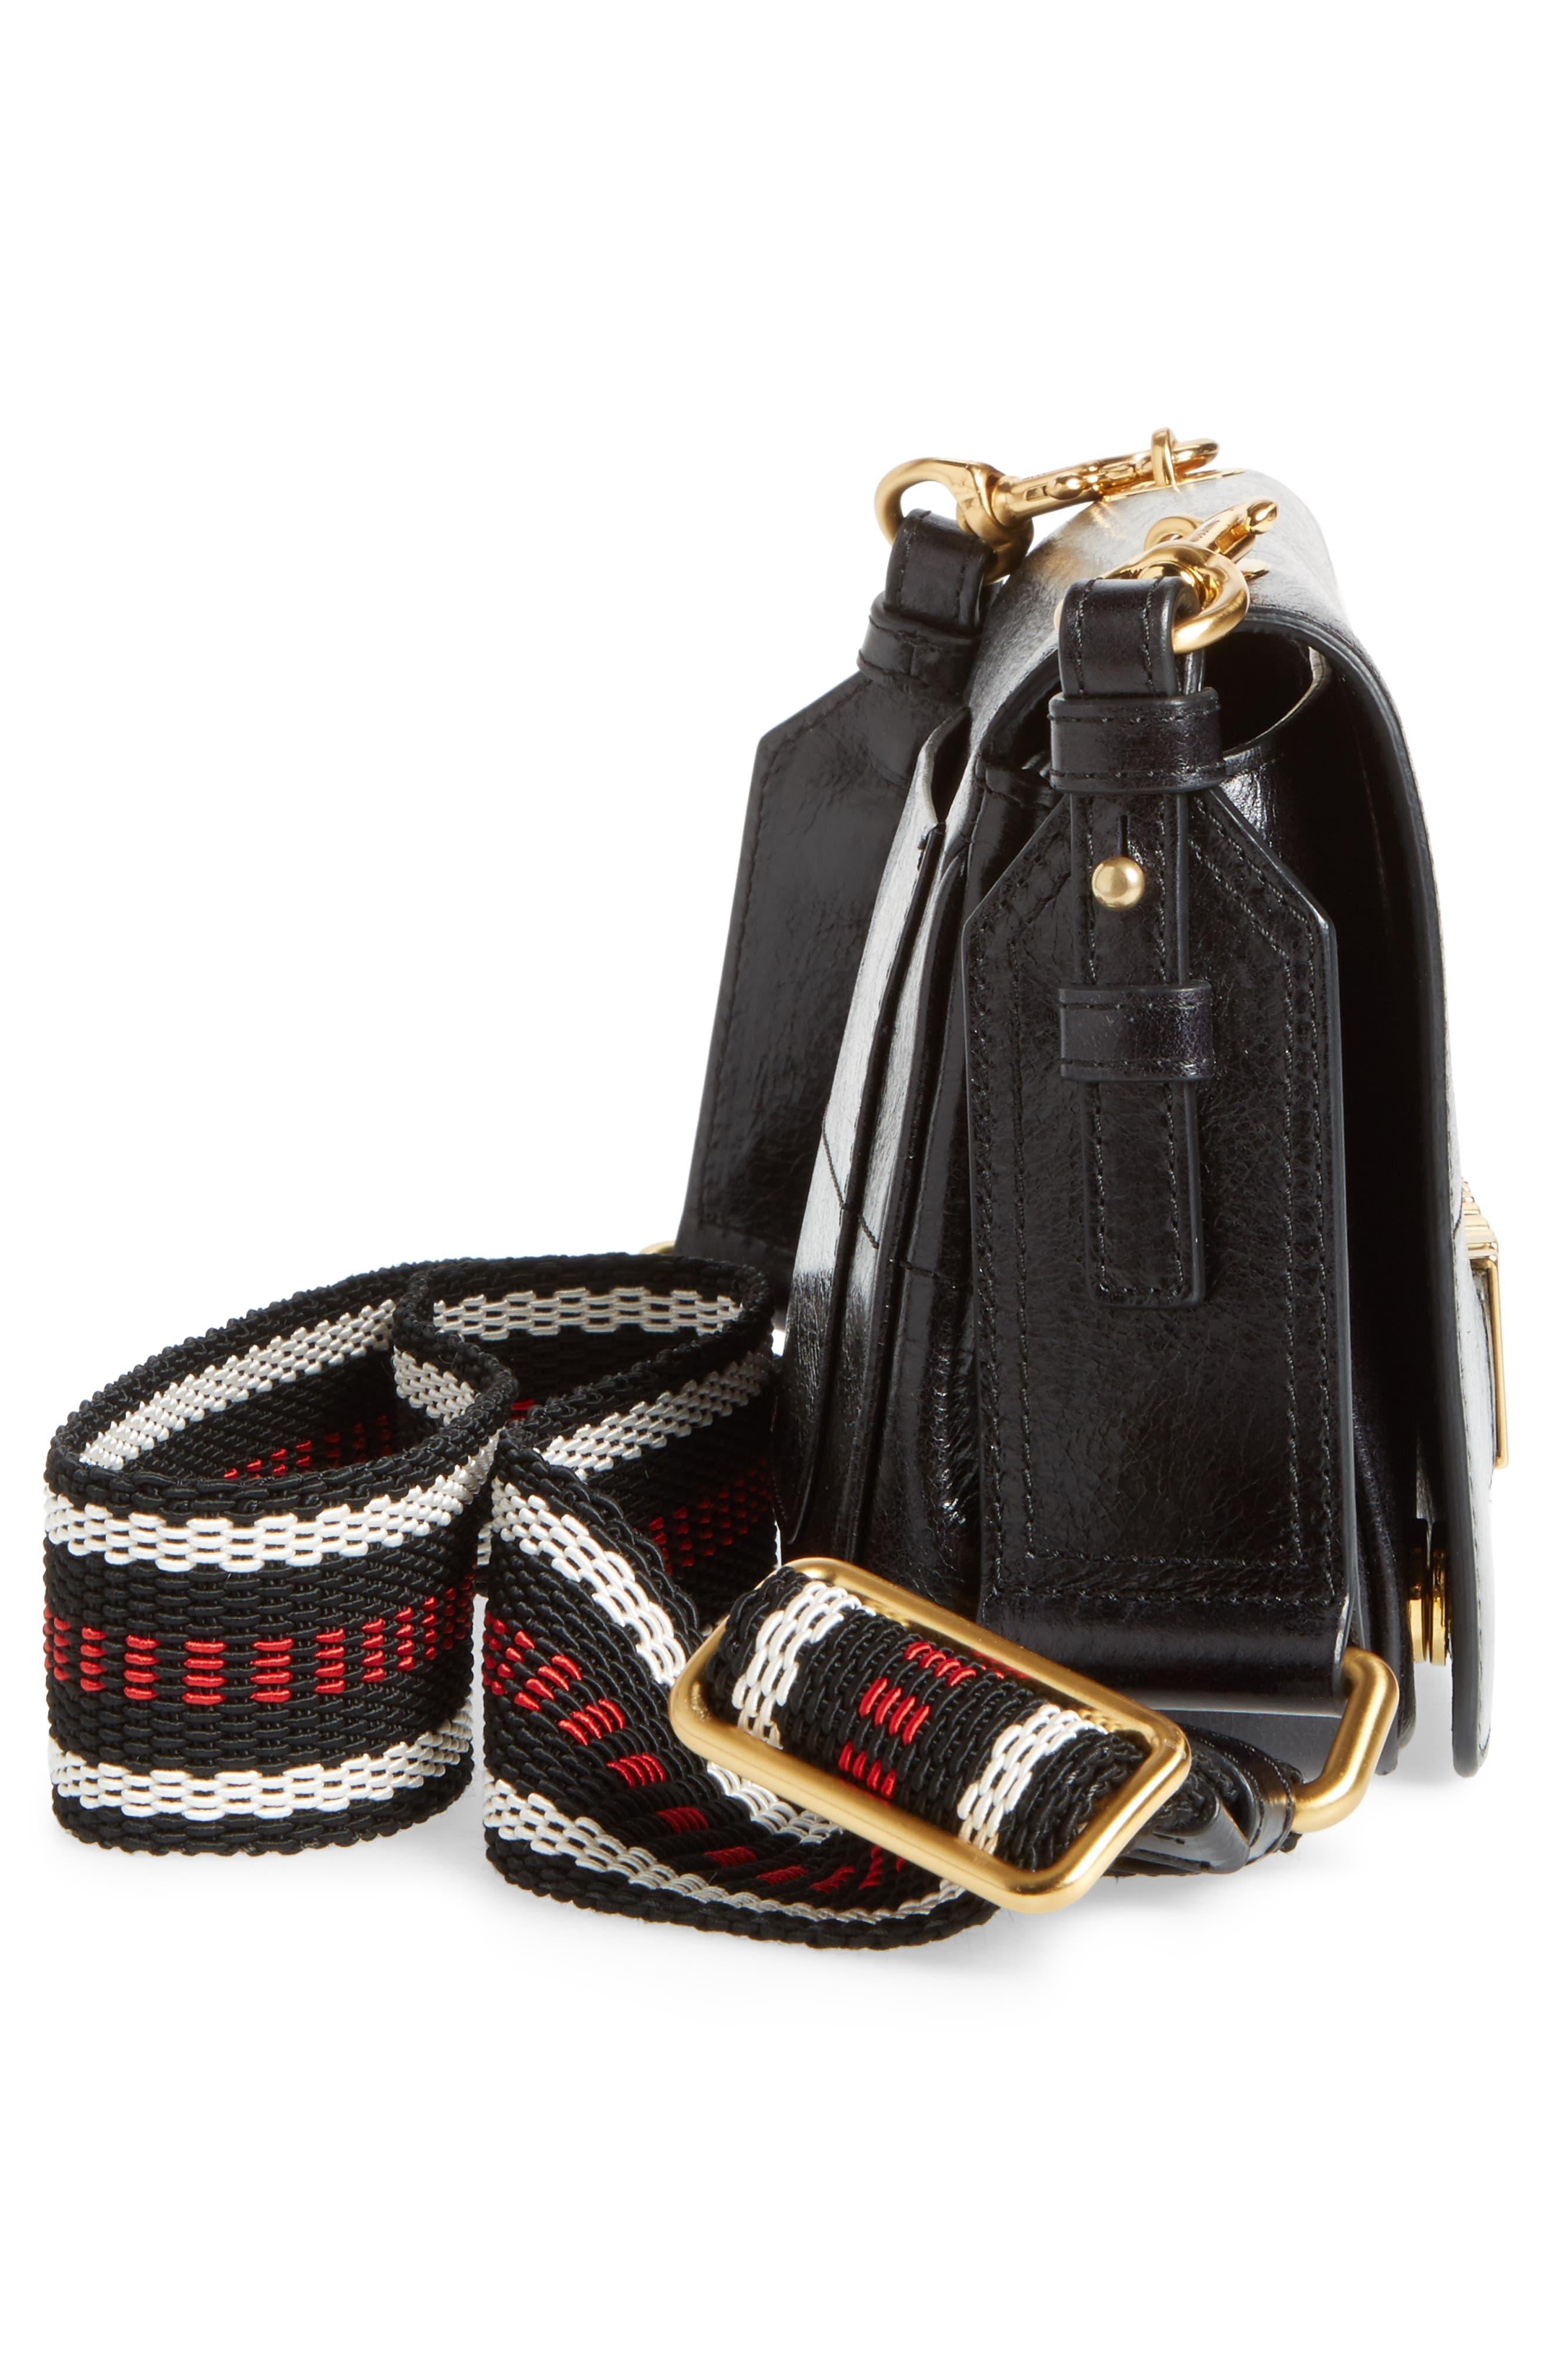 Logo Calfskin Leather Crossbody Bag,                             Alternate thumbnail 5, color,                             Black